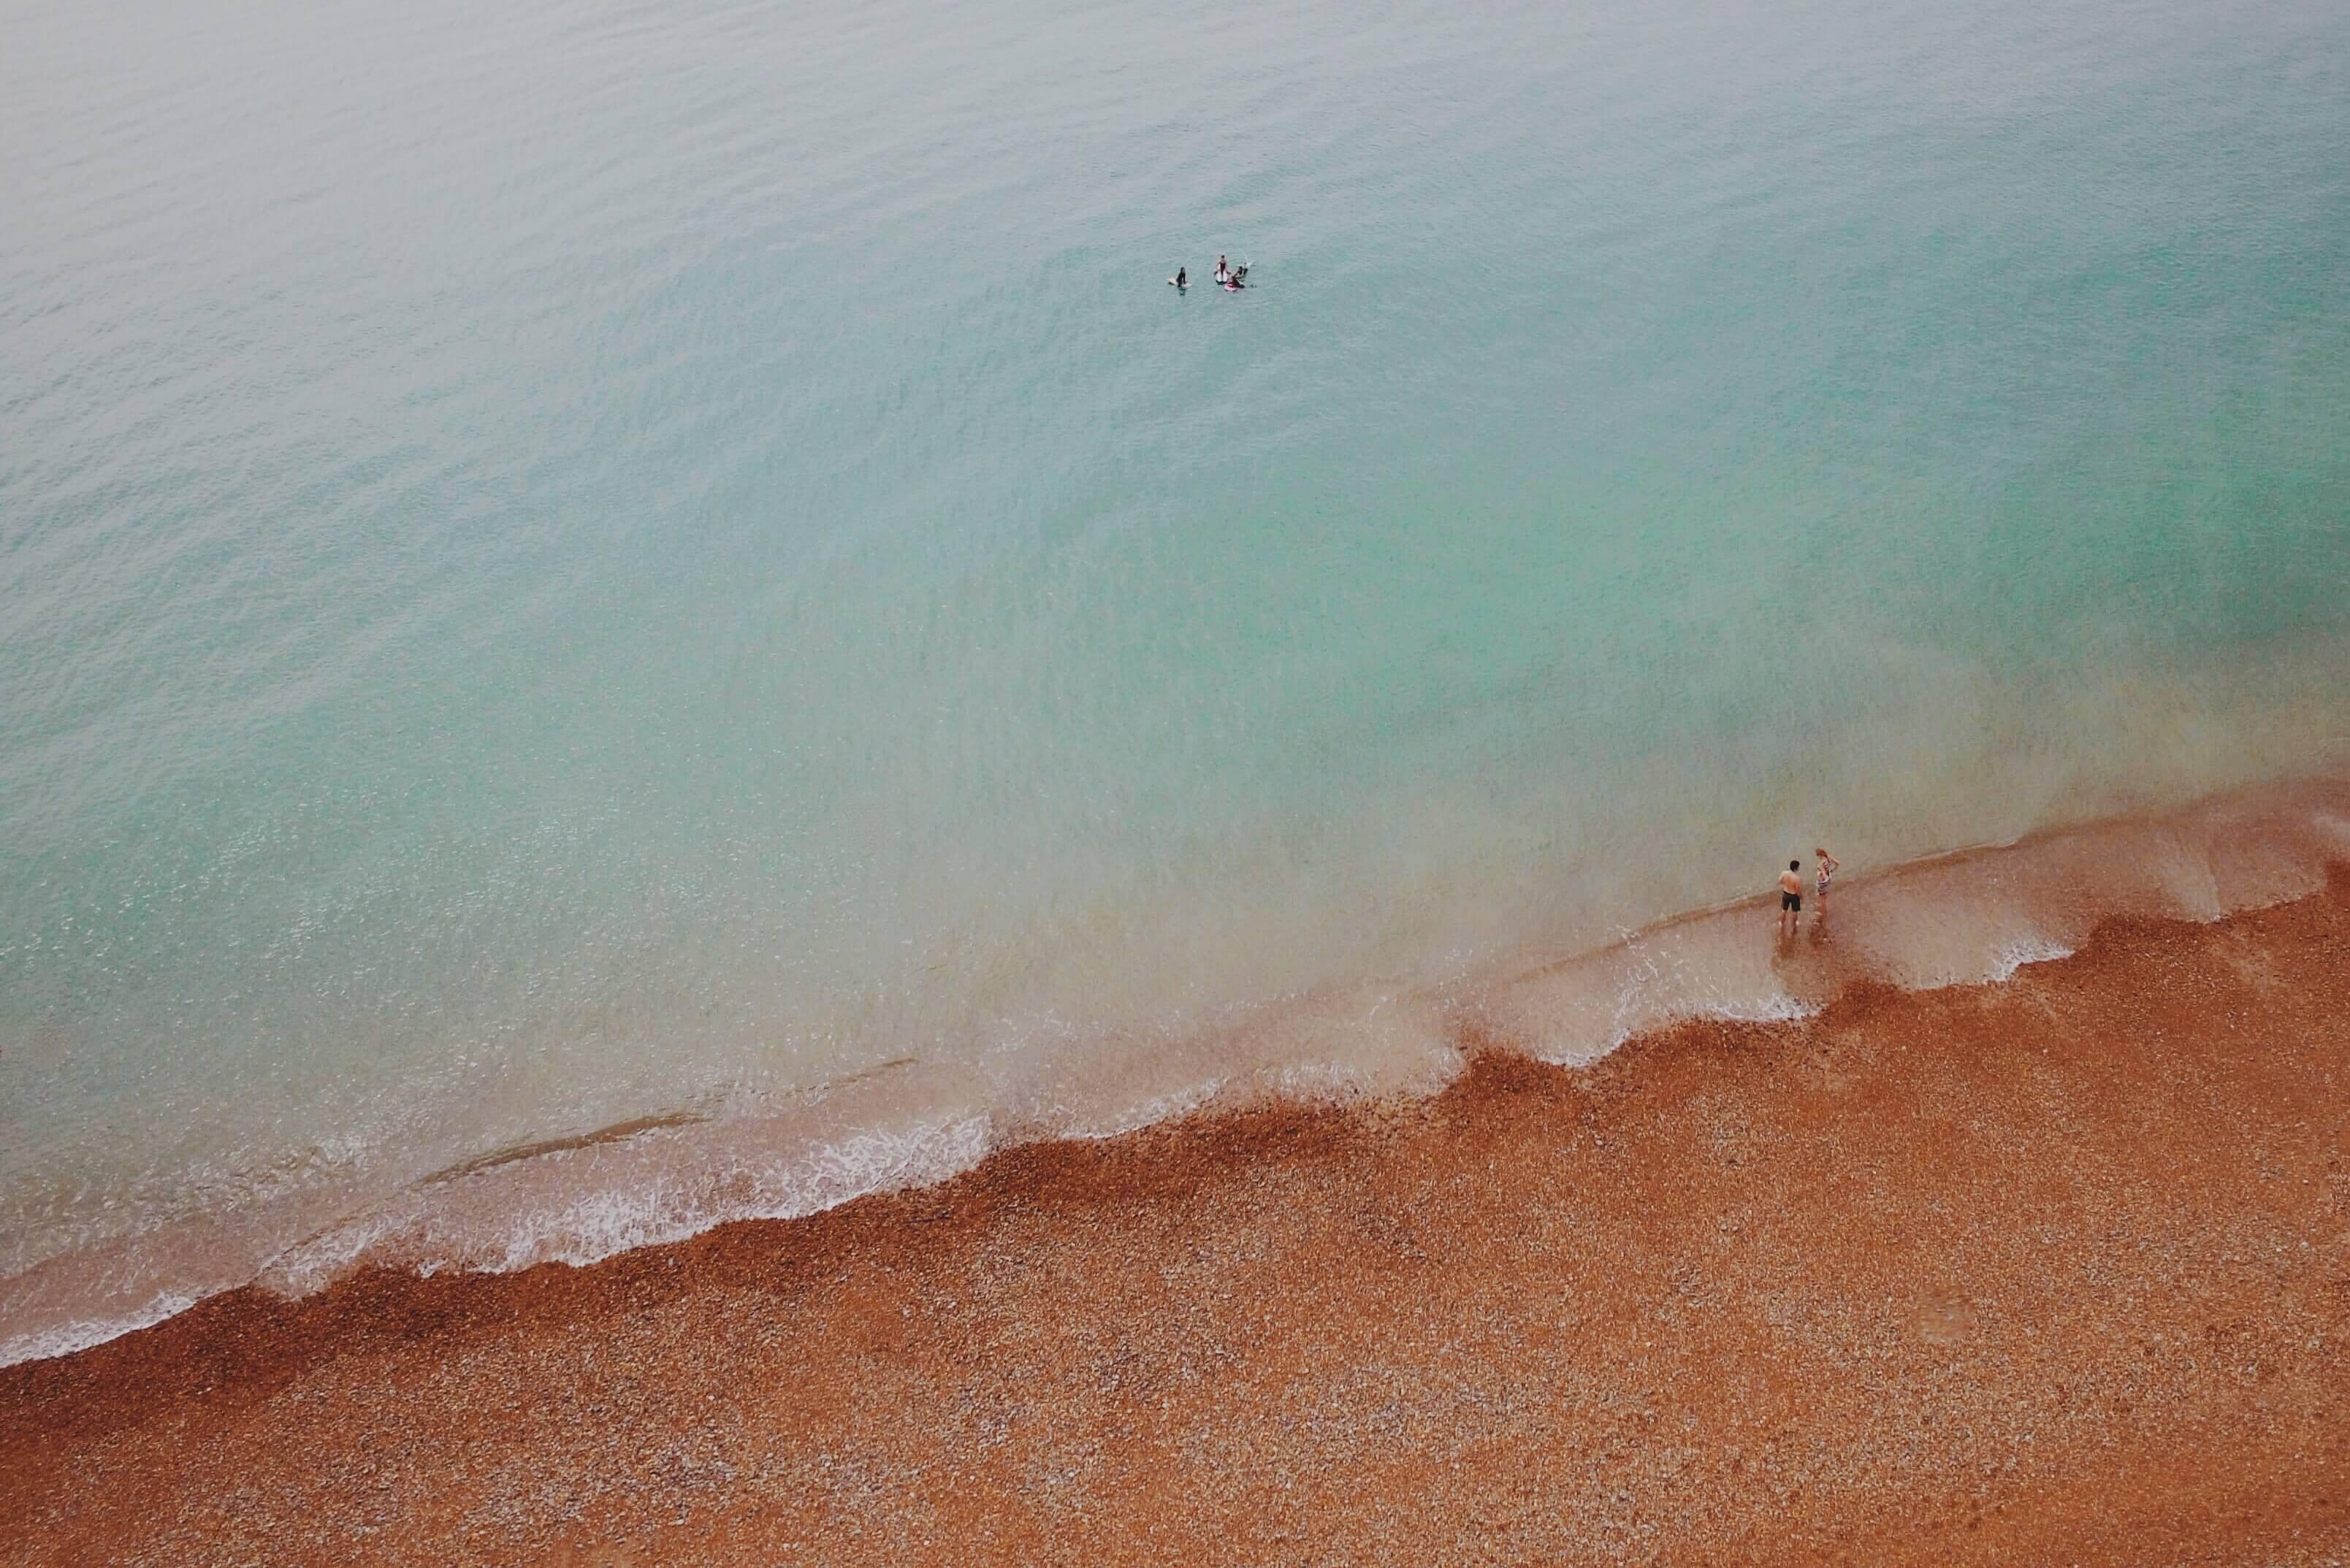 aerial view of people at seashore